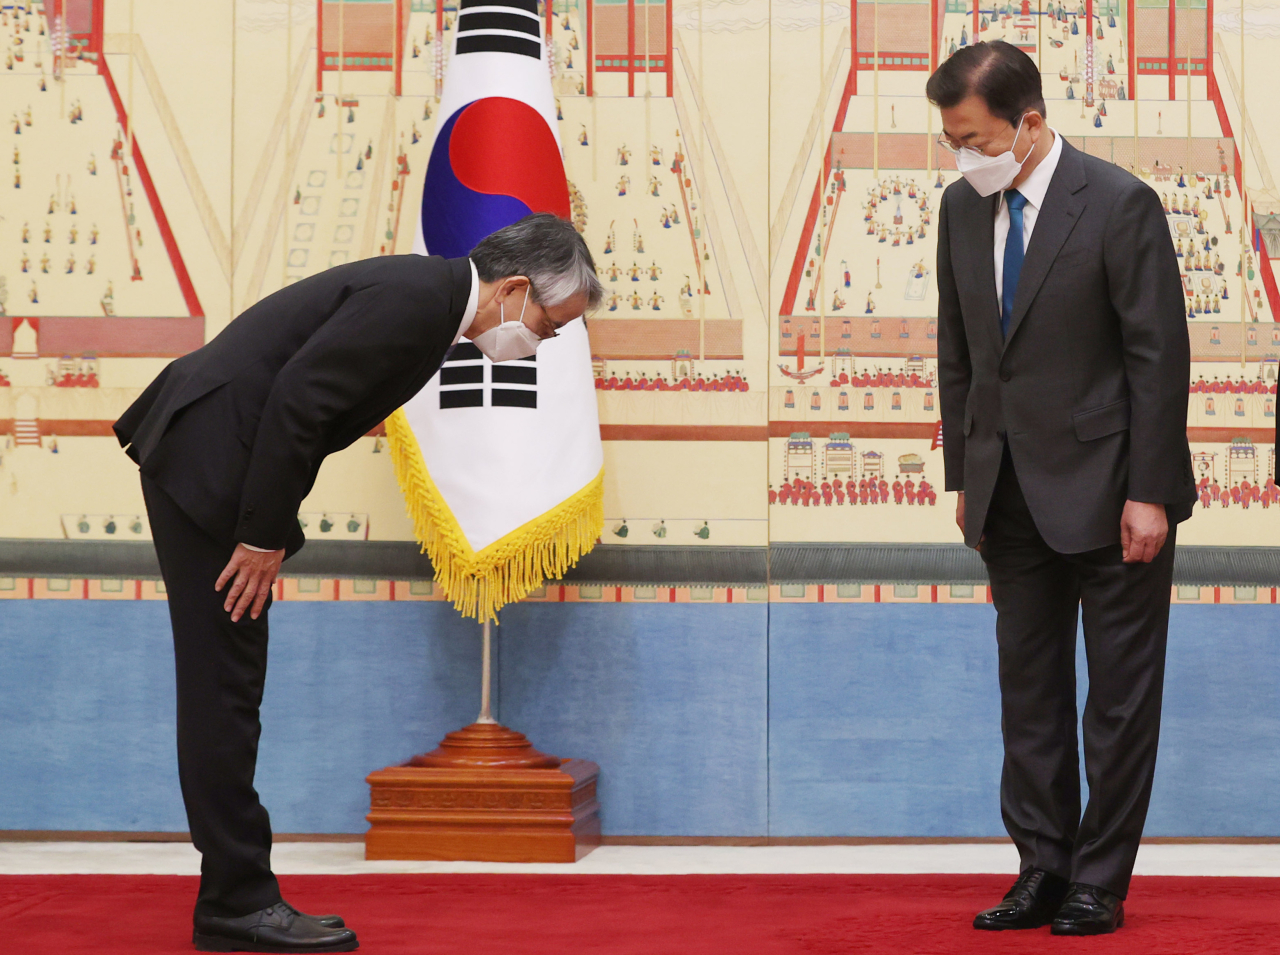 President Moon Jae-in (right) greets Japanese Ambassador to South Korea Koichi Aiboshi at Cheong Wa Dae on Wednesday. (Yonhap)